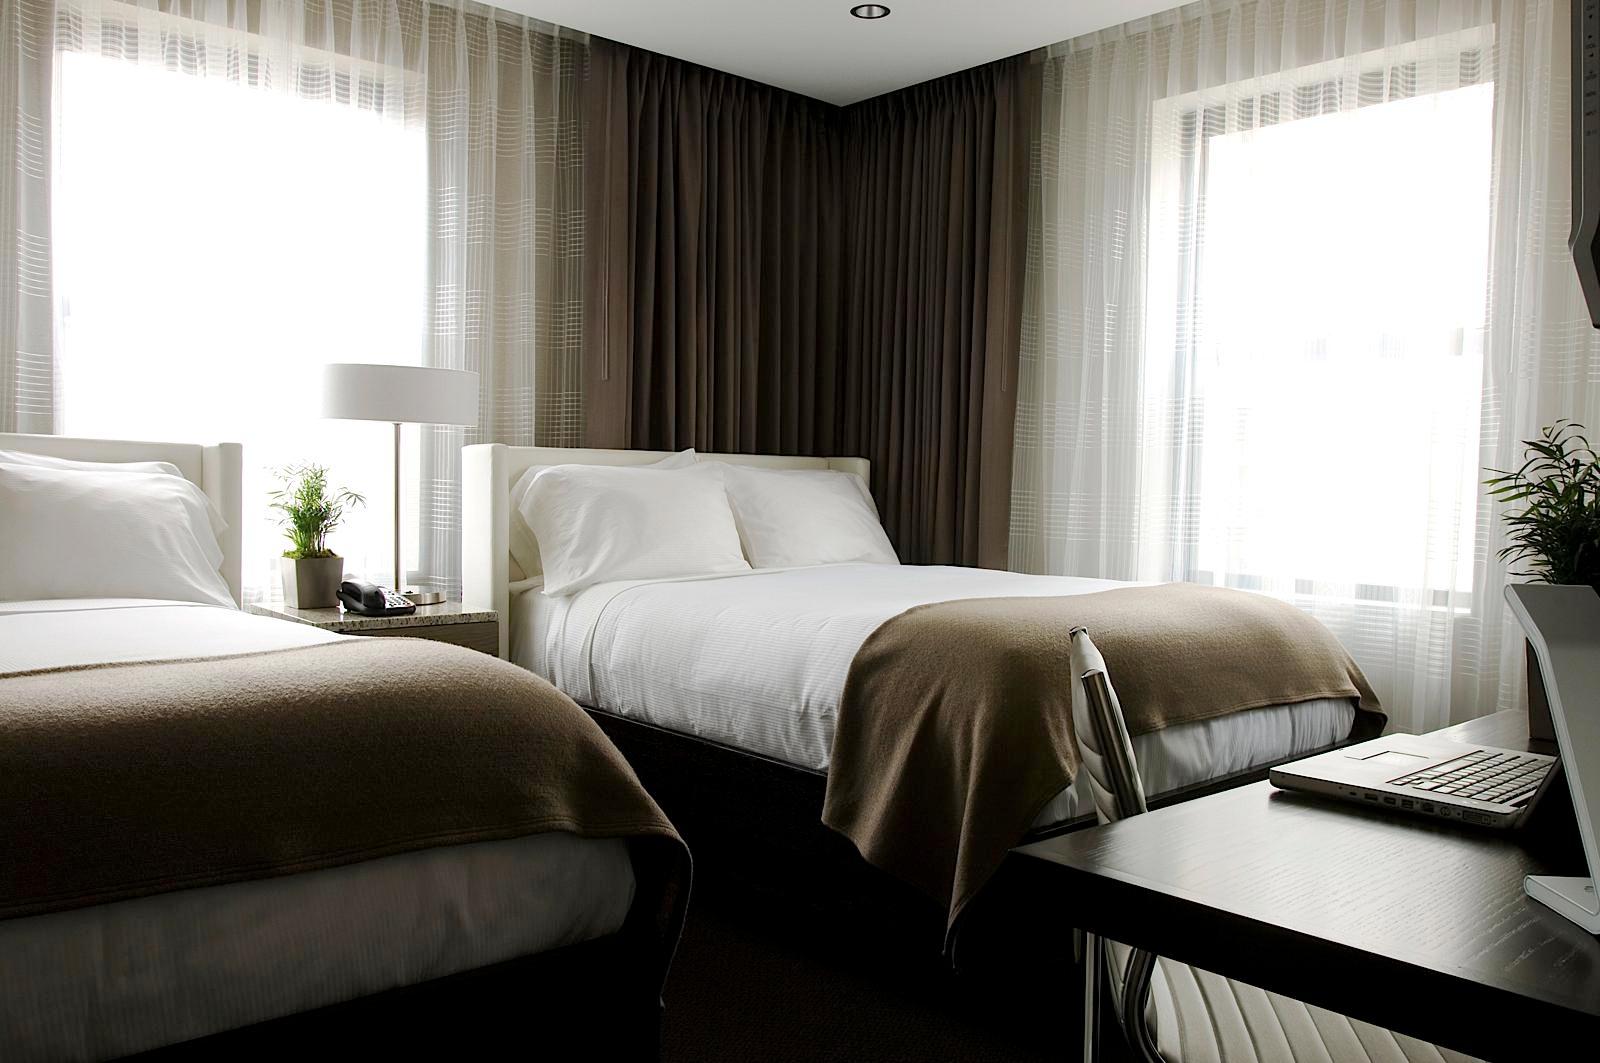 Hotel Felix image 5